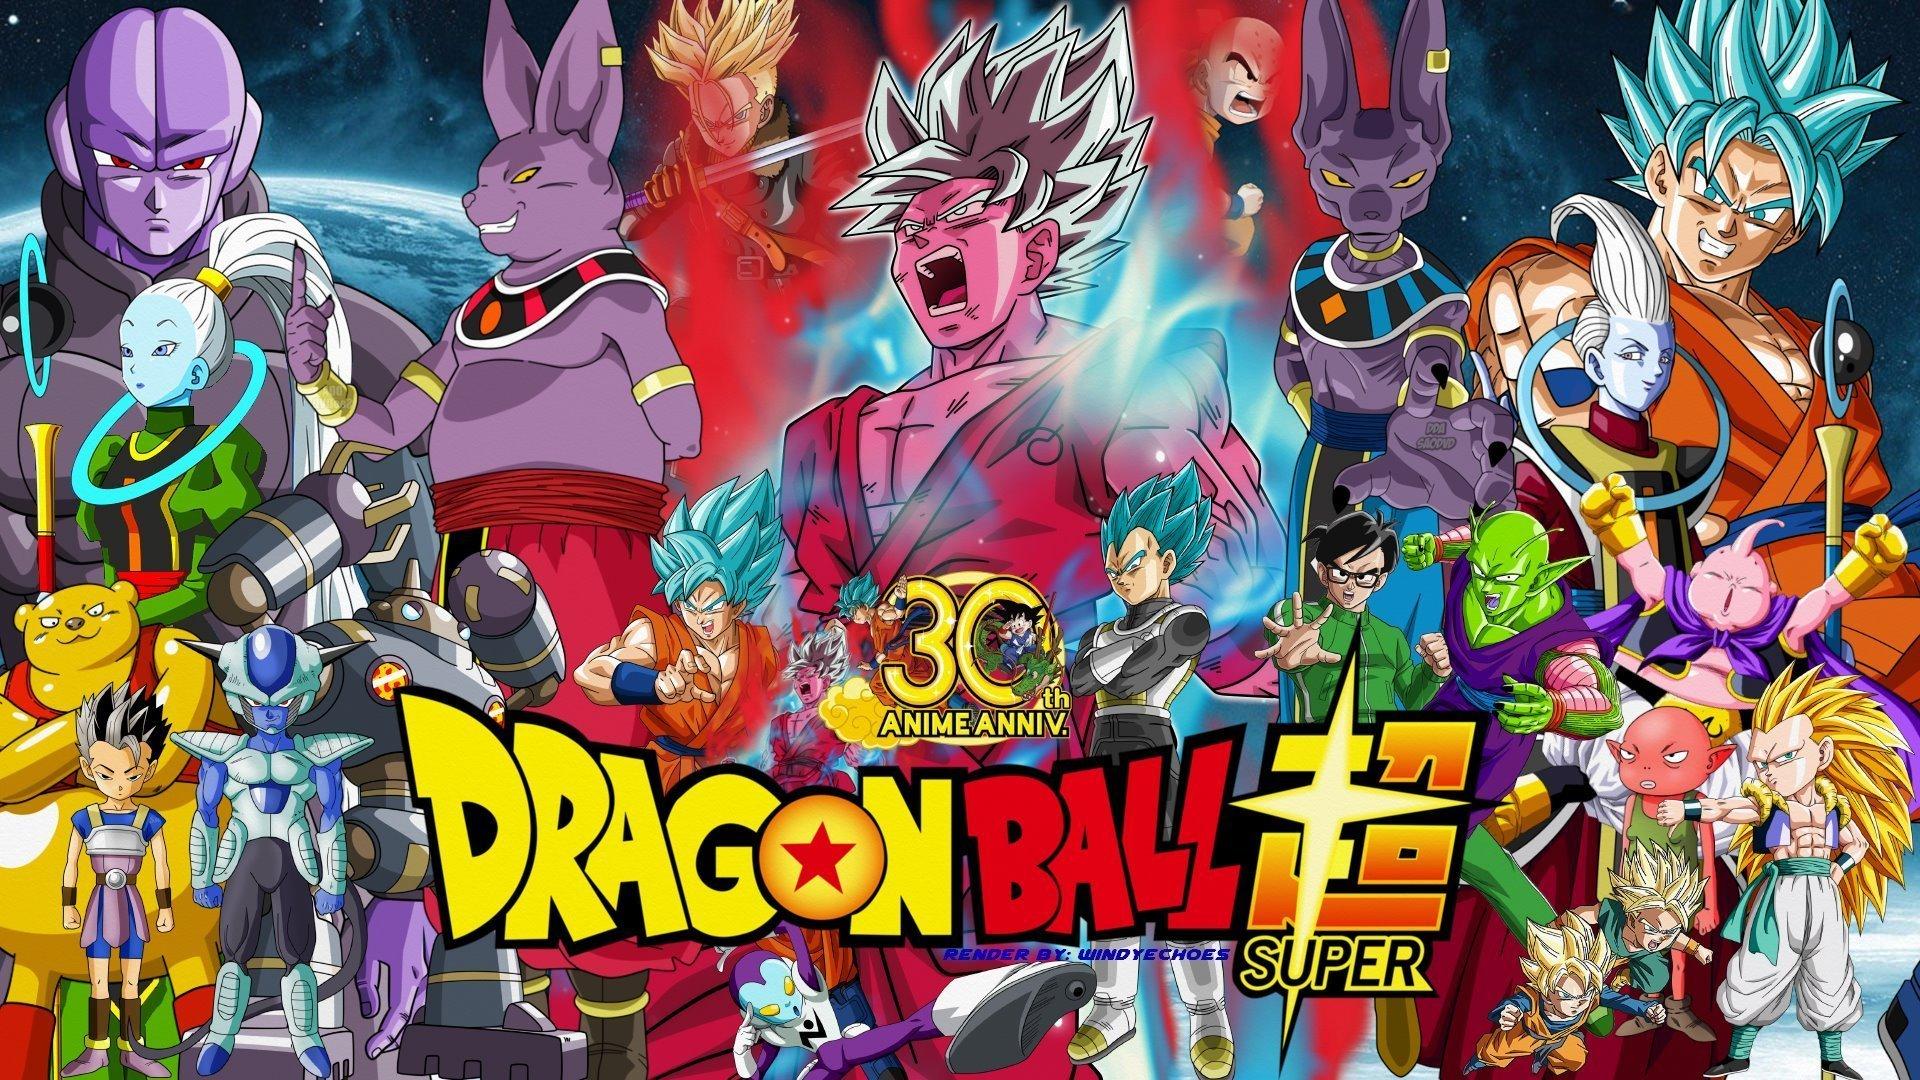 dragon ball super wallpaper 1080p